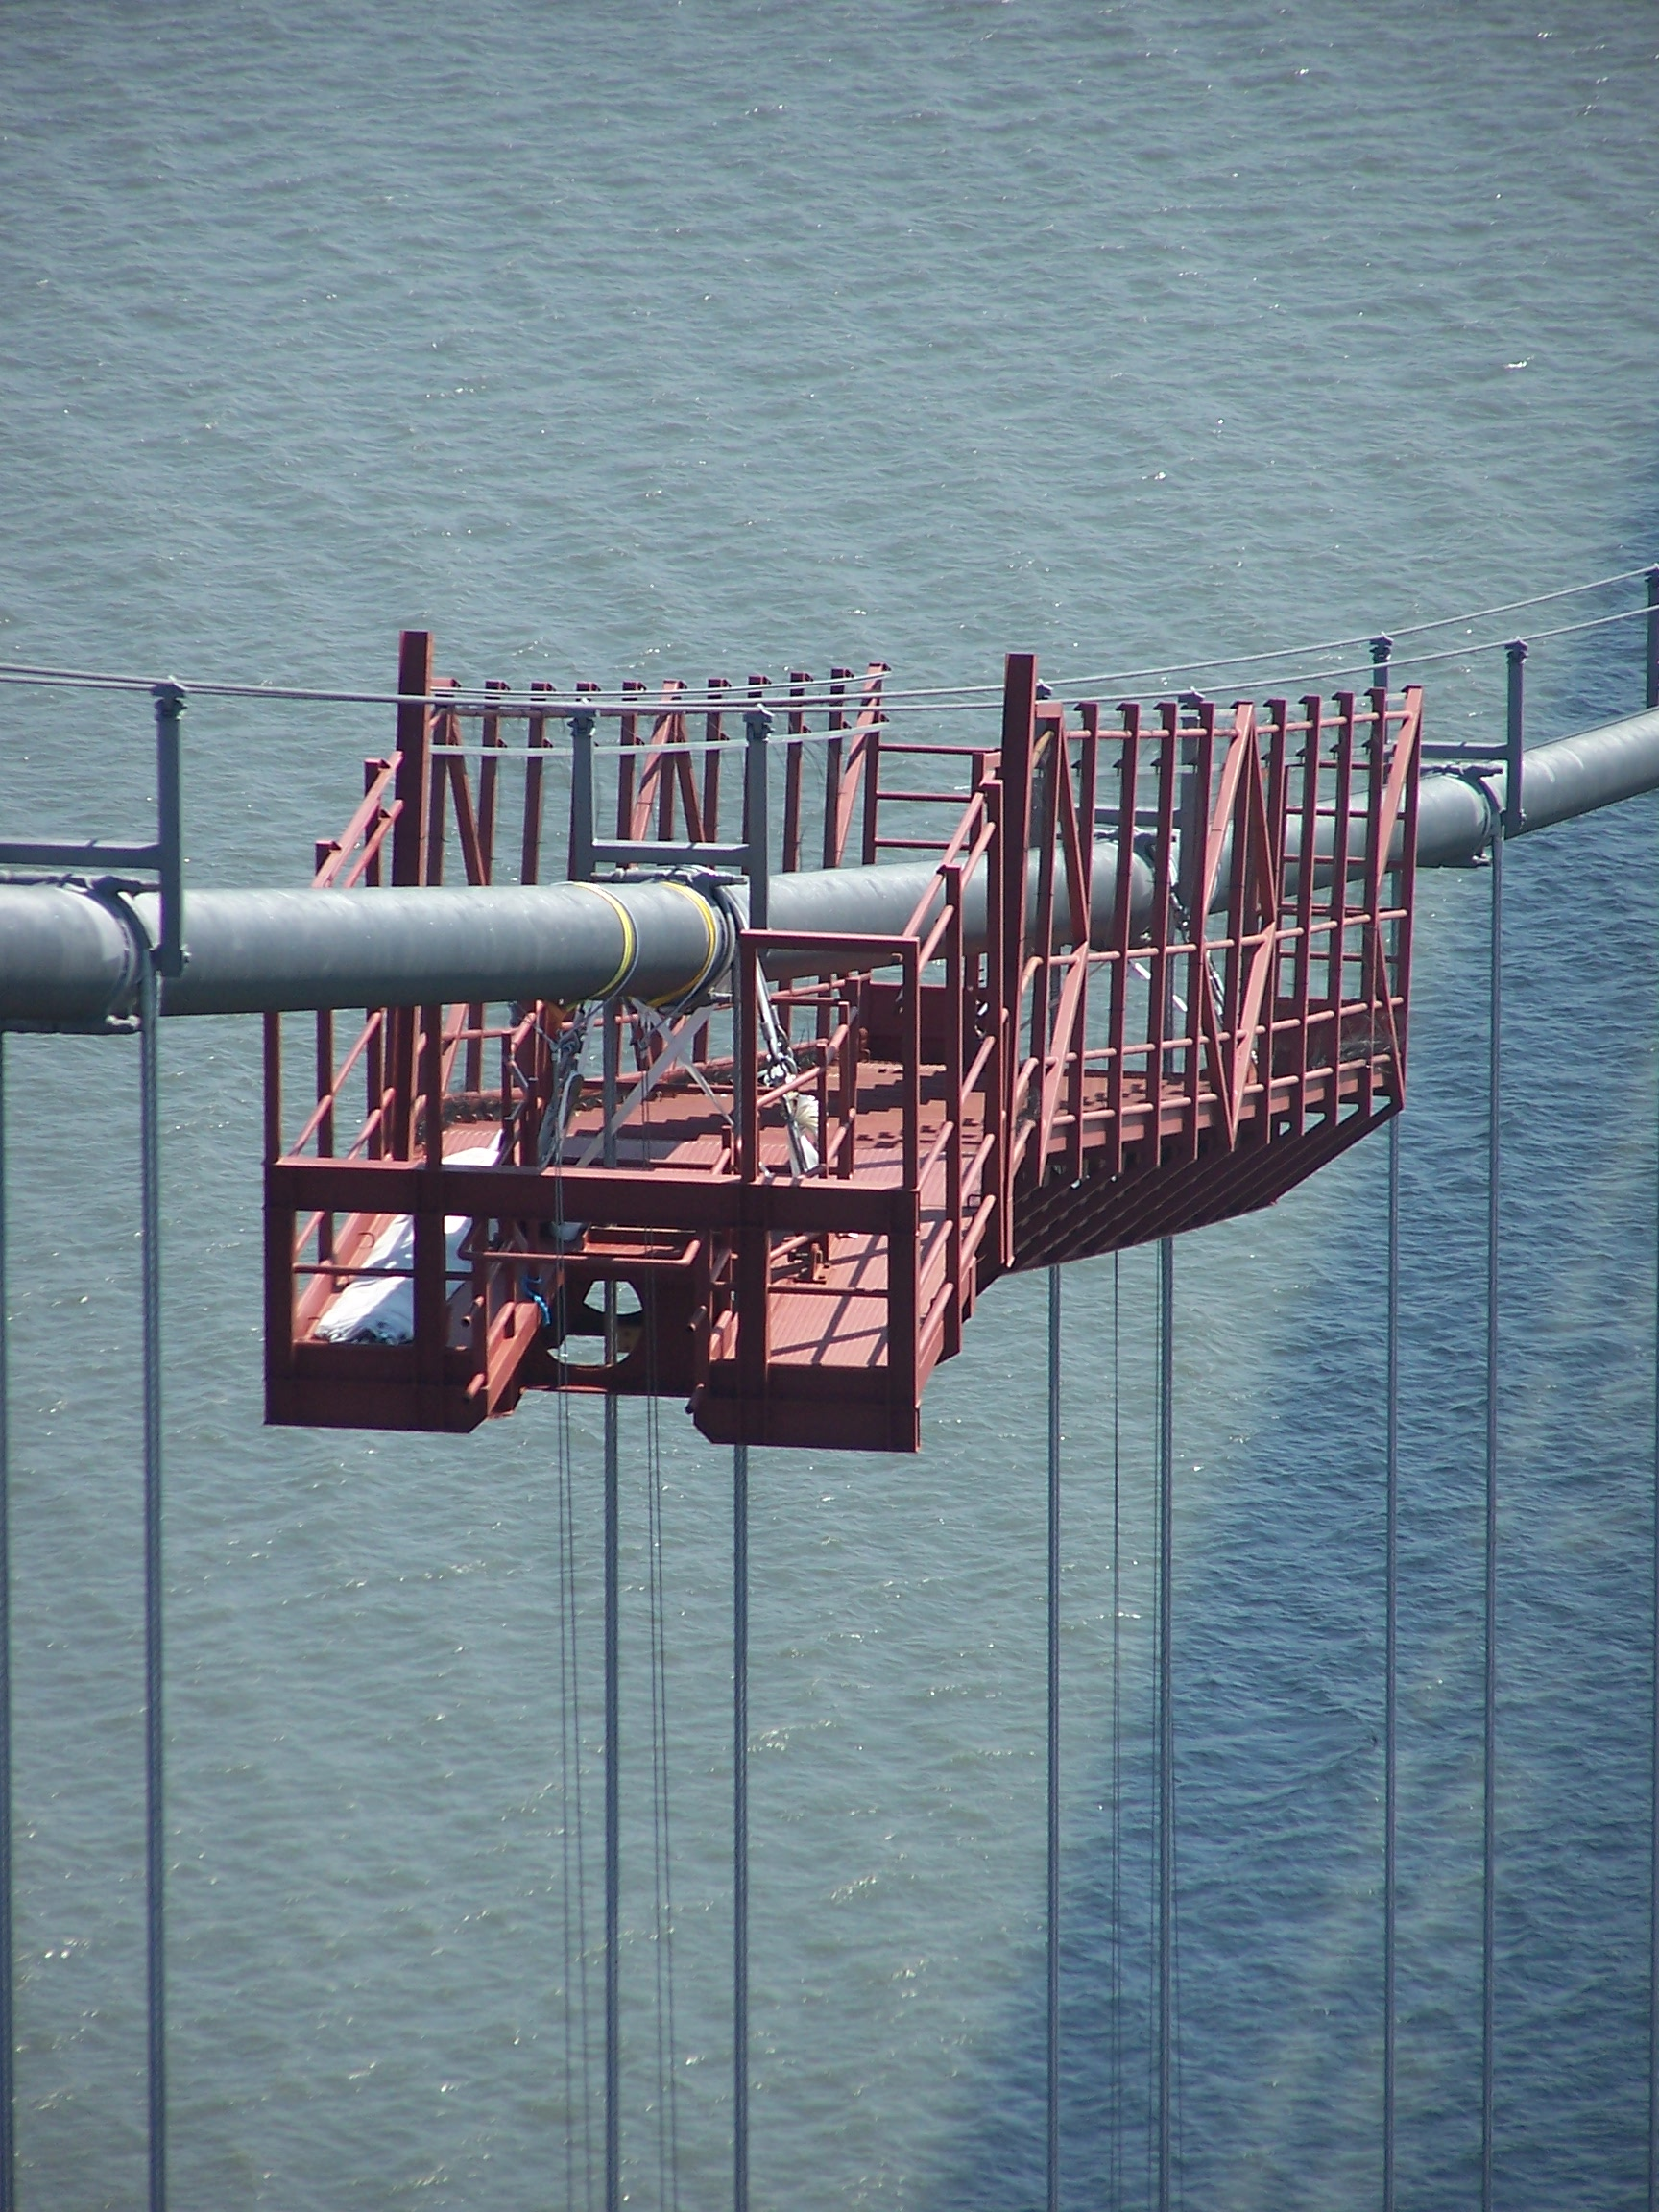 Forth Road Bridge Cable gantry walkway and handrail Edinburgh